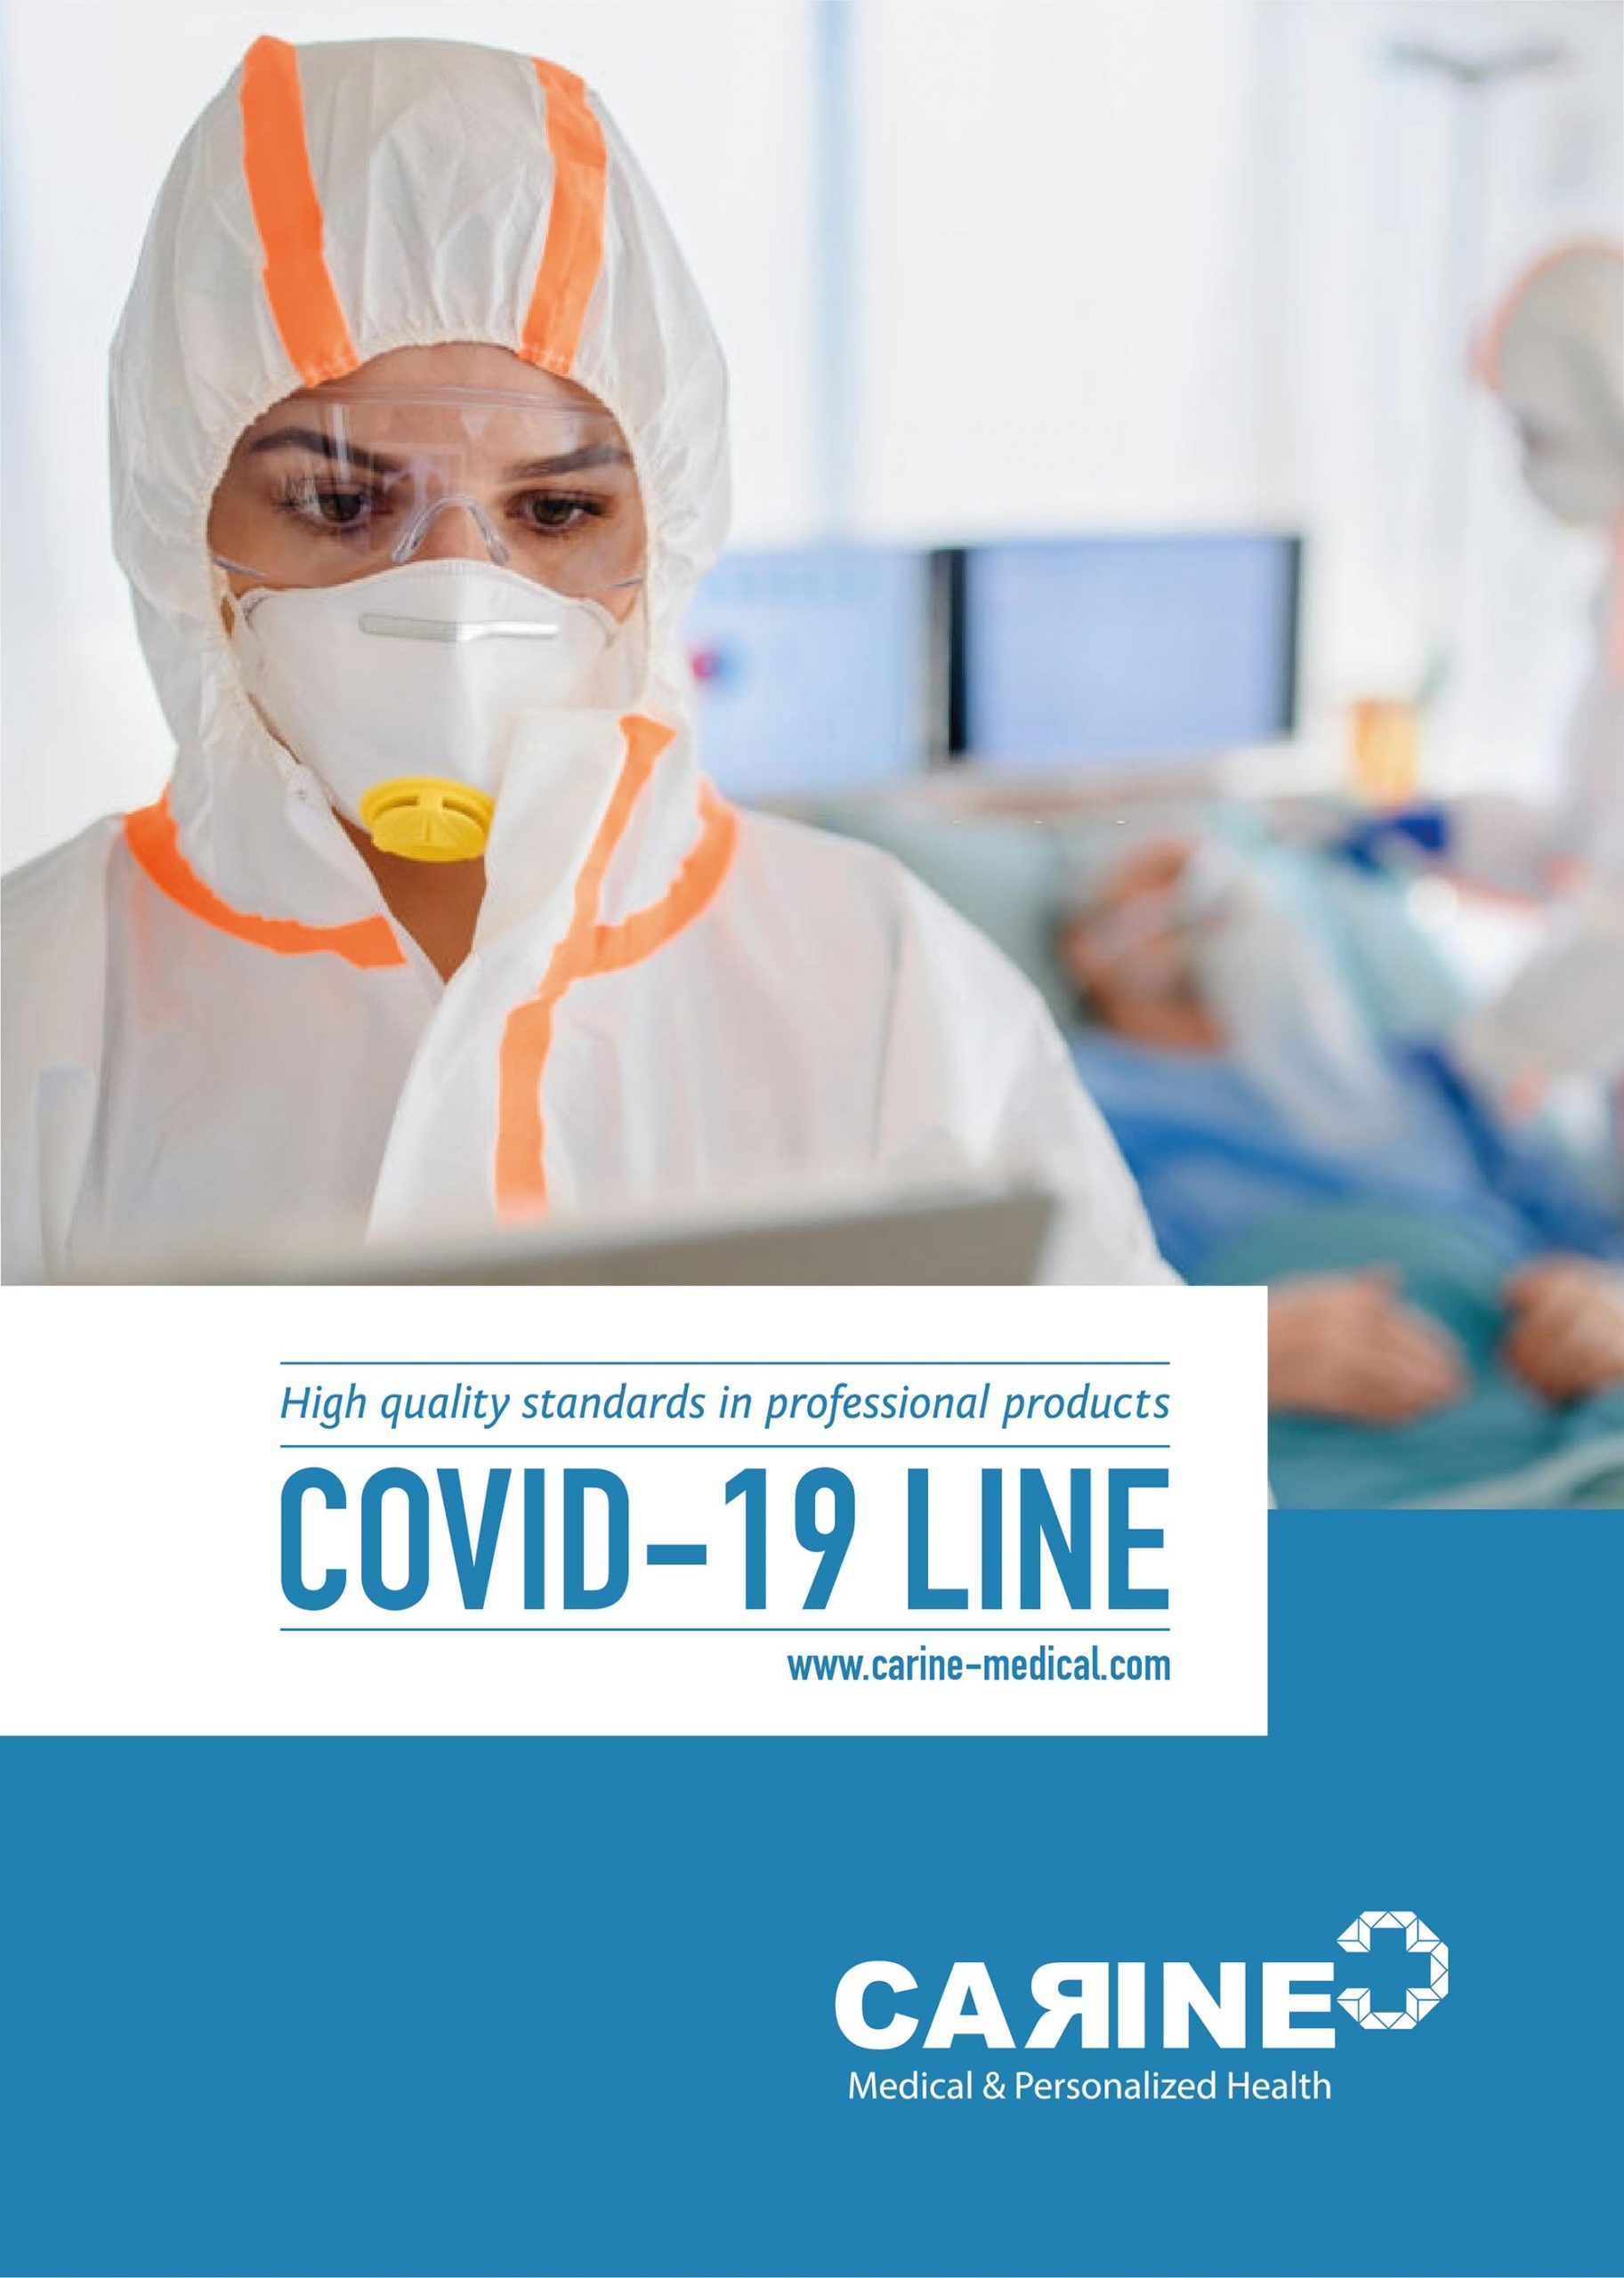 CARINE MEDICAL COVID-19 LINE